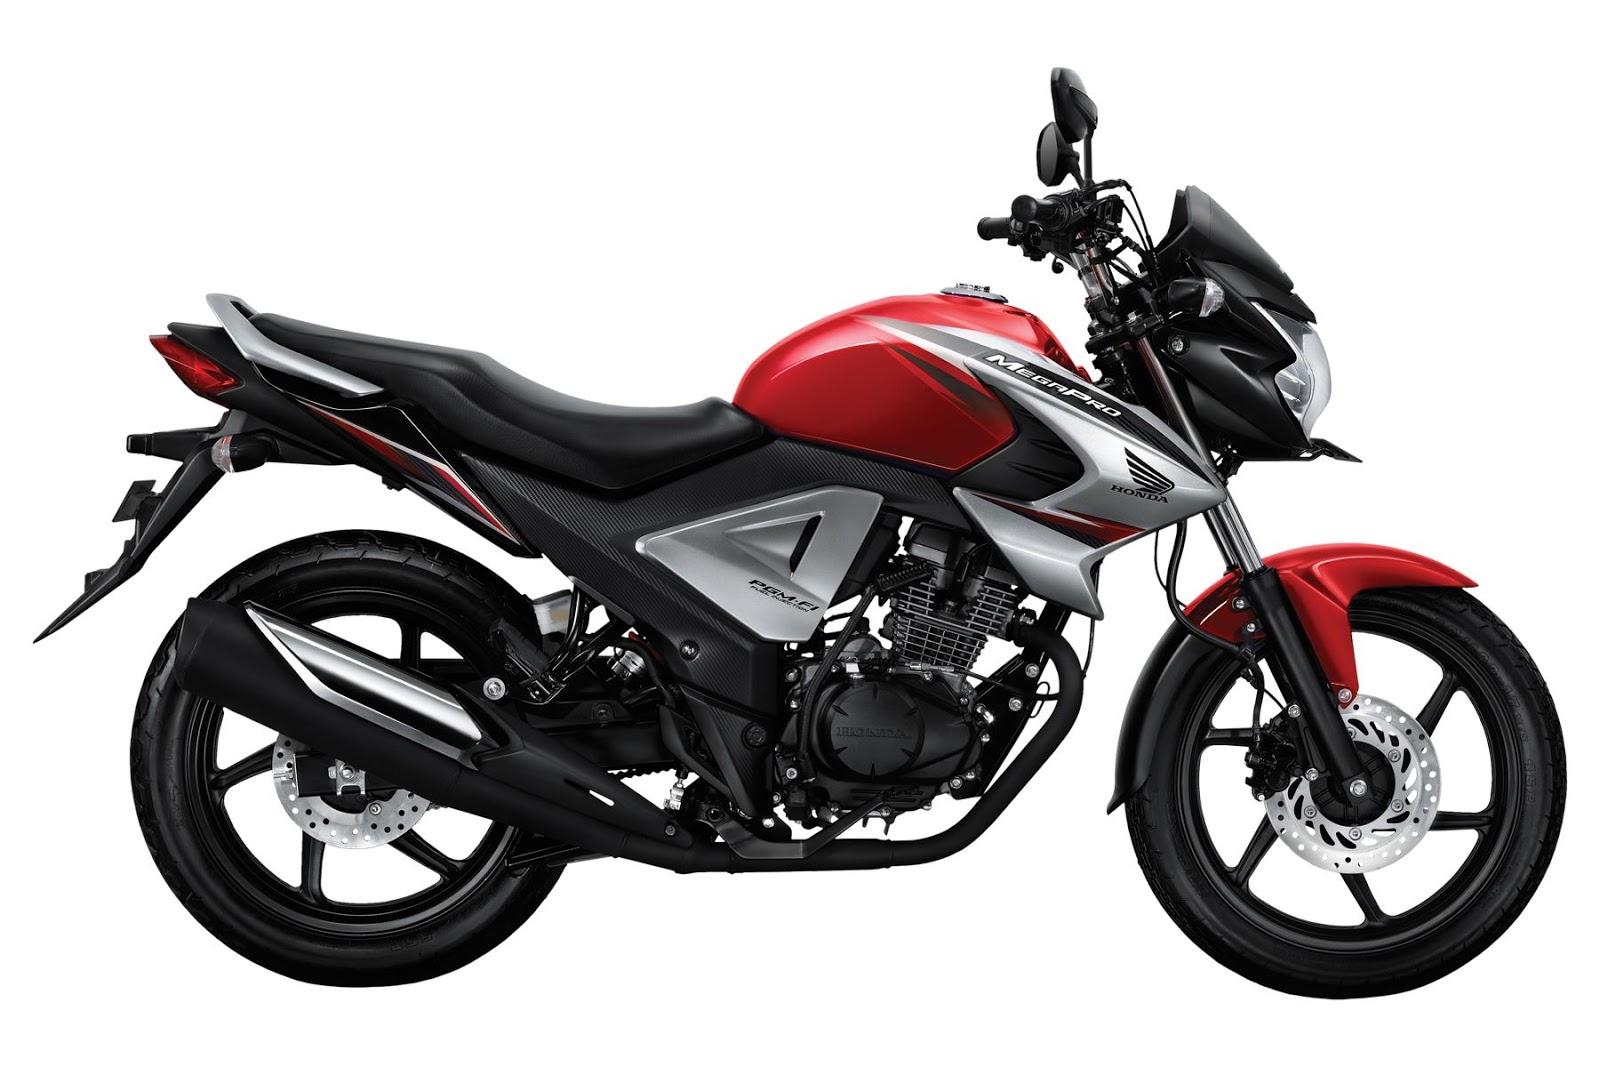 Harga Motor Honda Megapro FI dan Spesifikasi Lengkap